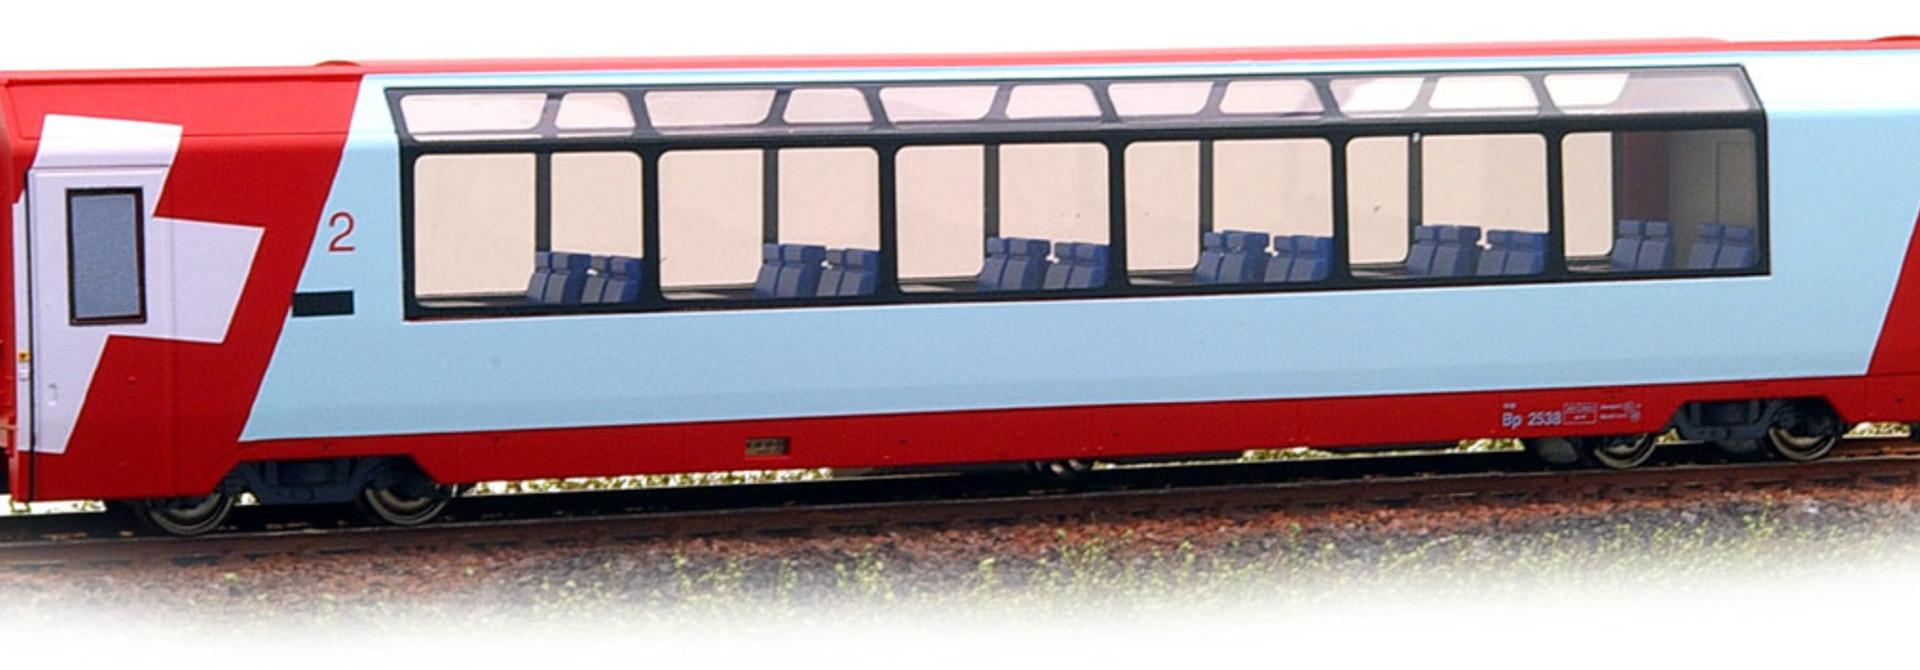 3289128 RhB Bp 2538 Panoramawagen GEX